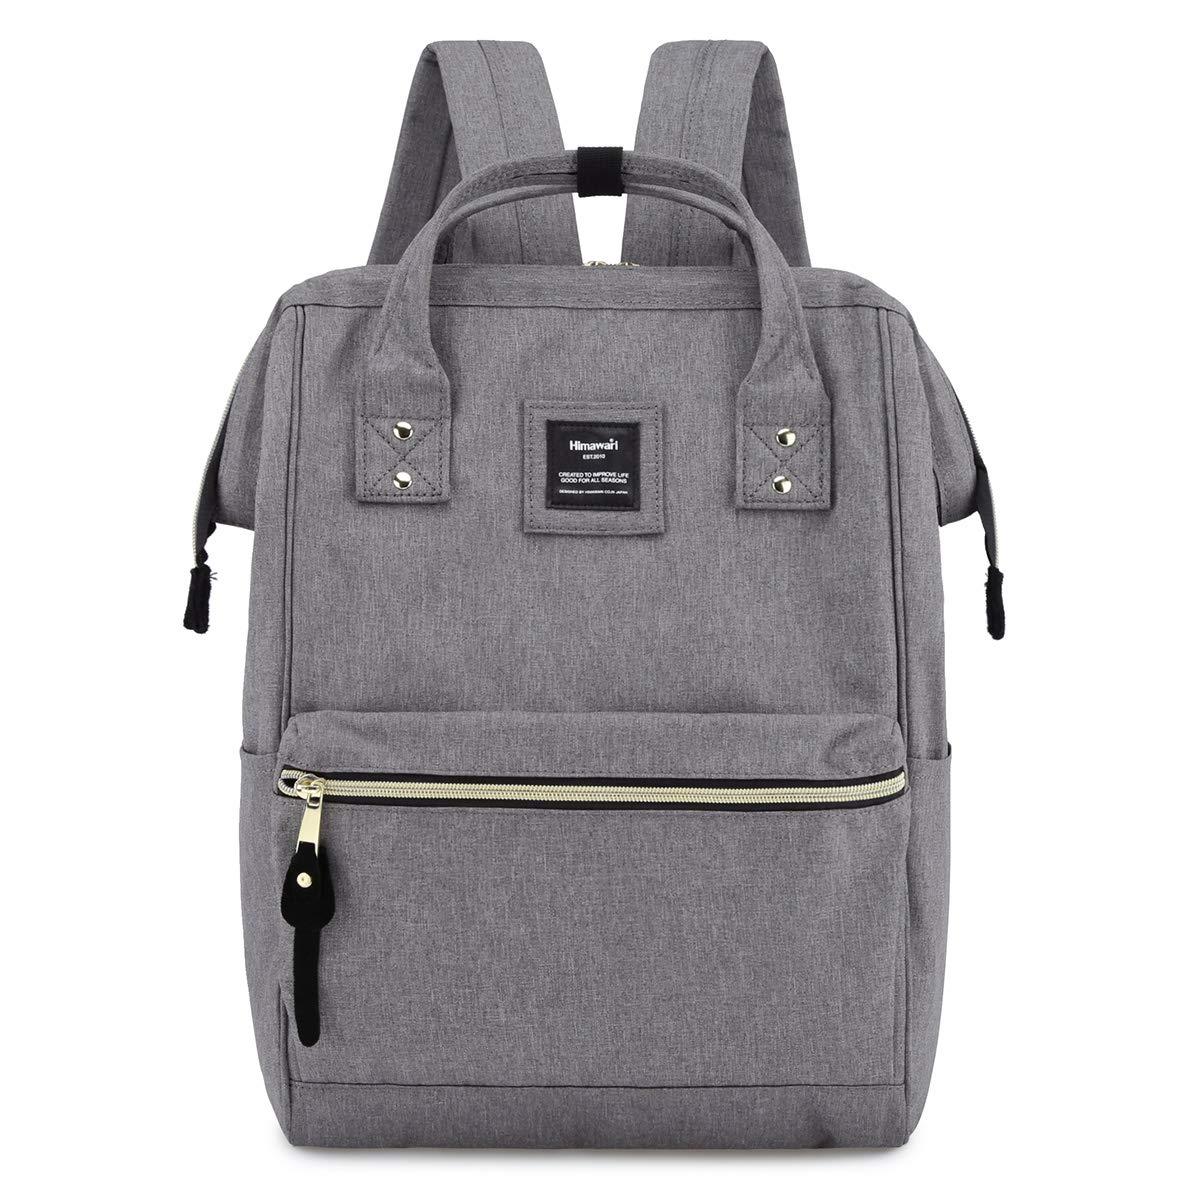 Himawari Laptop Backpack Travel Backpack With USB Charging Port Large Diaper Bag Doctor Bag School Backpack for Women&Men (9001-Gray)